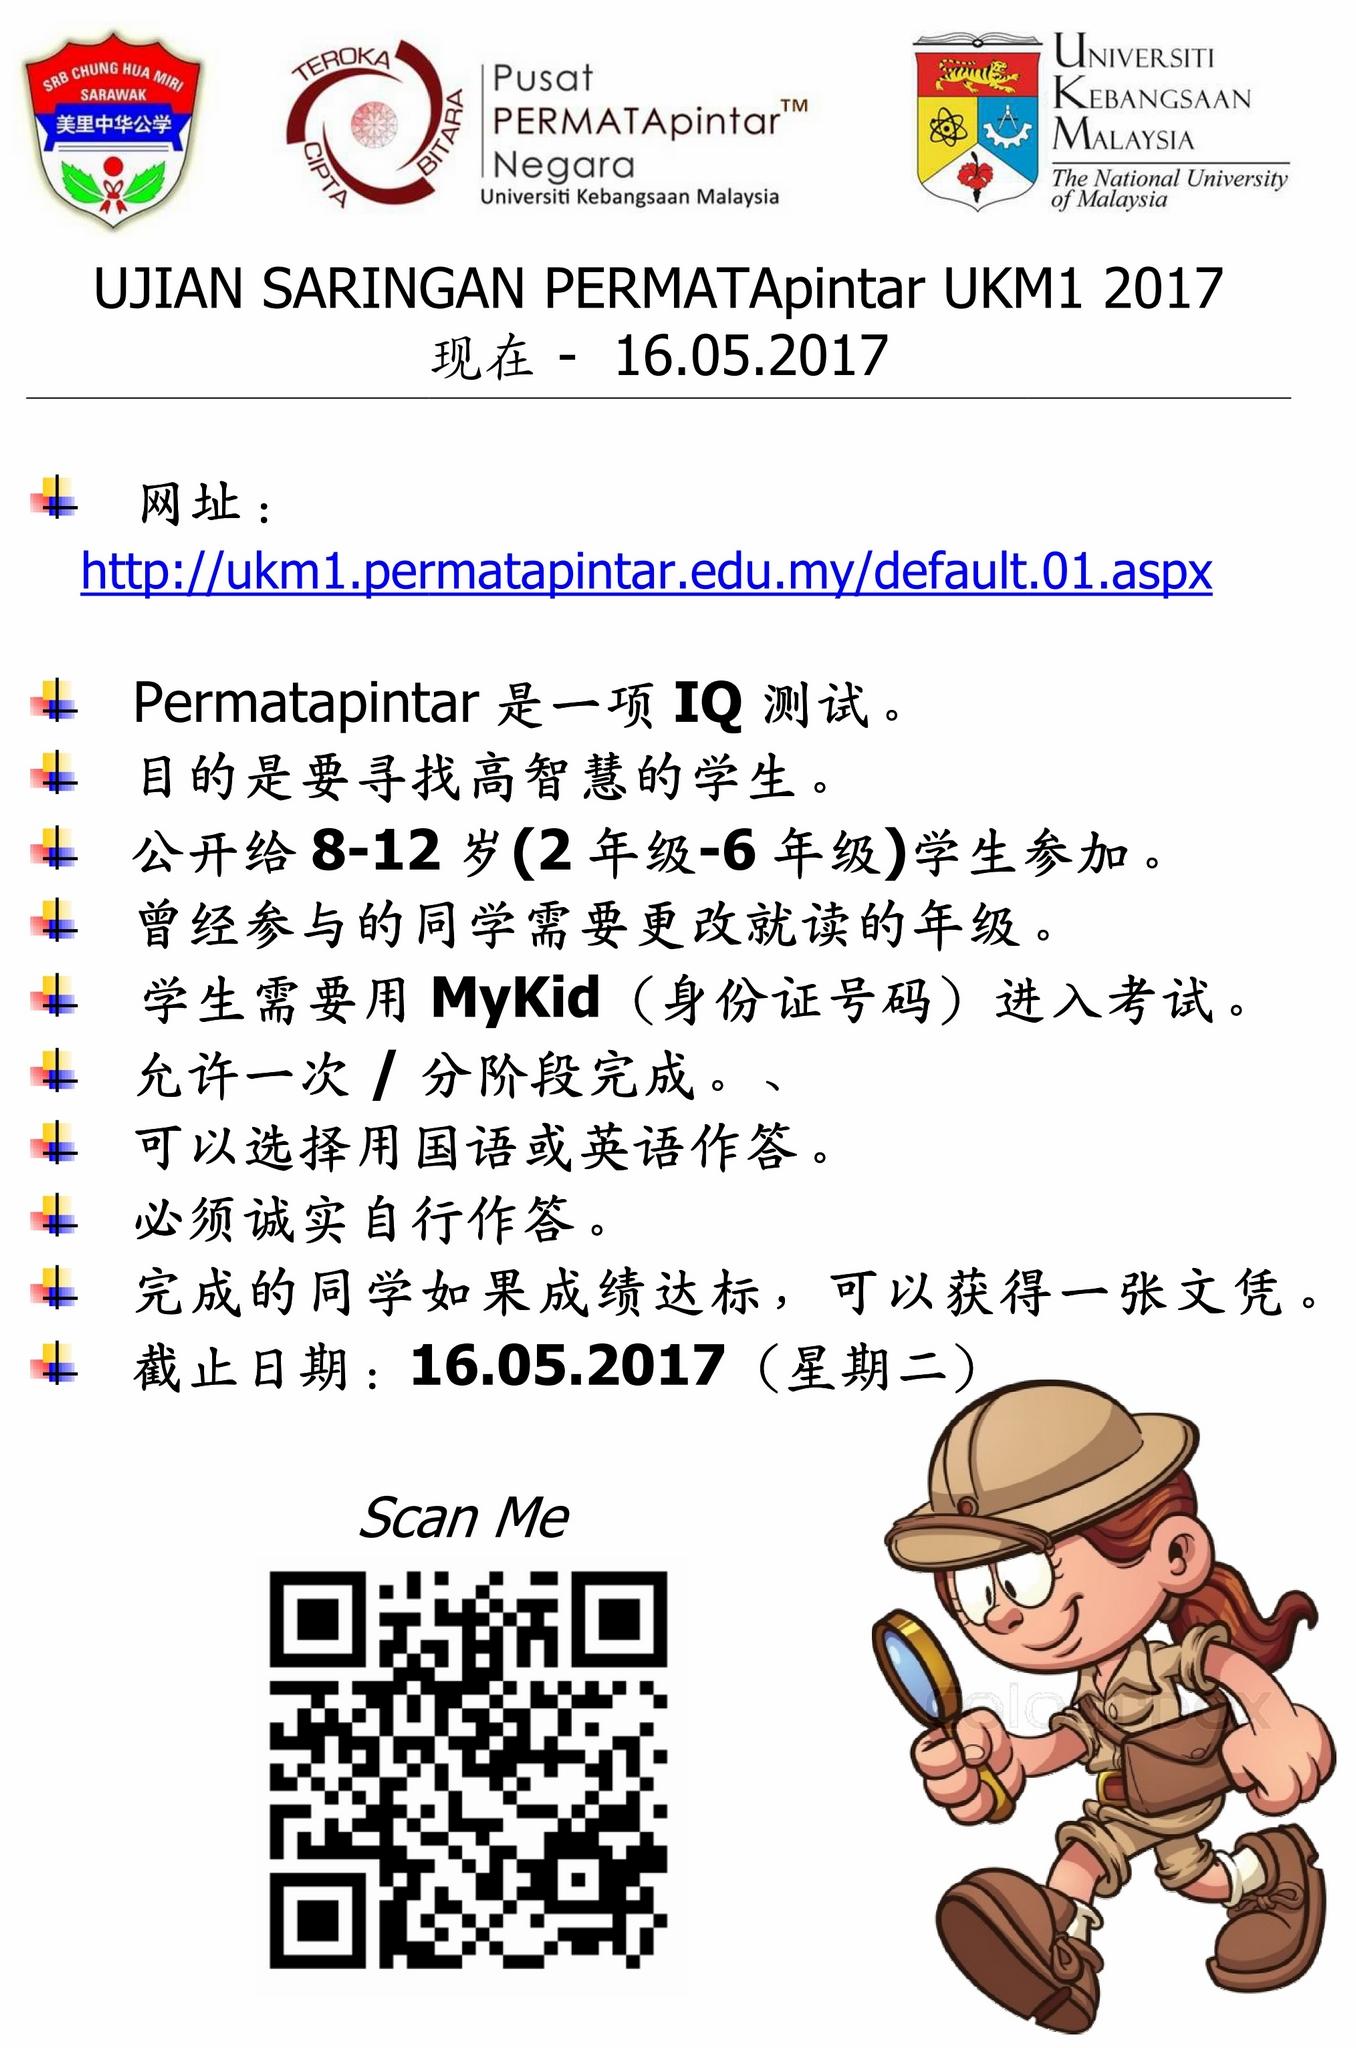 _2017 notis UJIAN SARINGAN PERMATApintar UKM1 2017_01